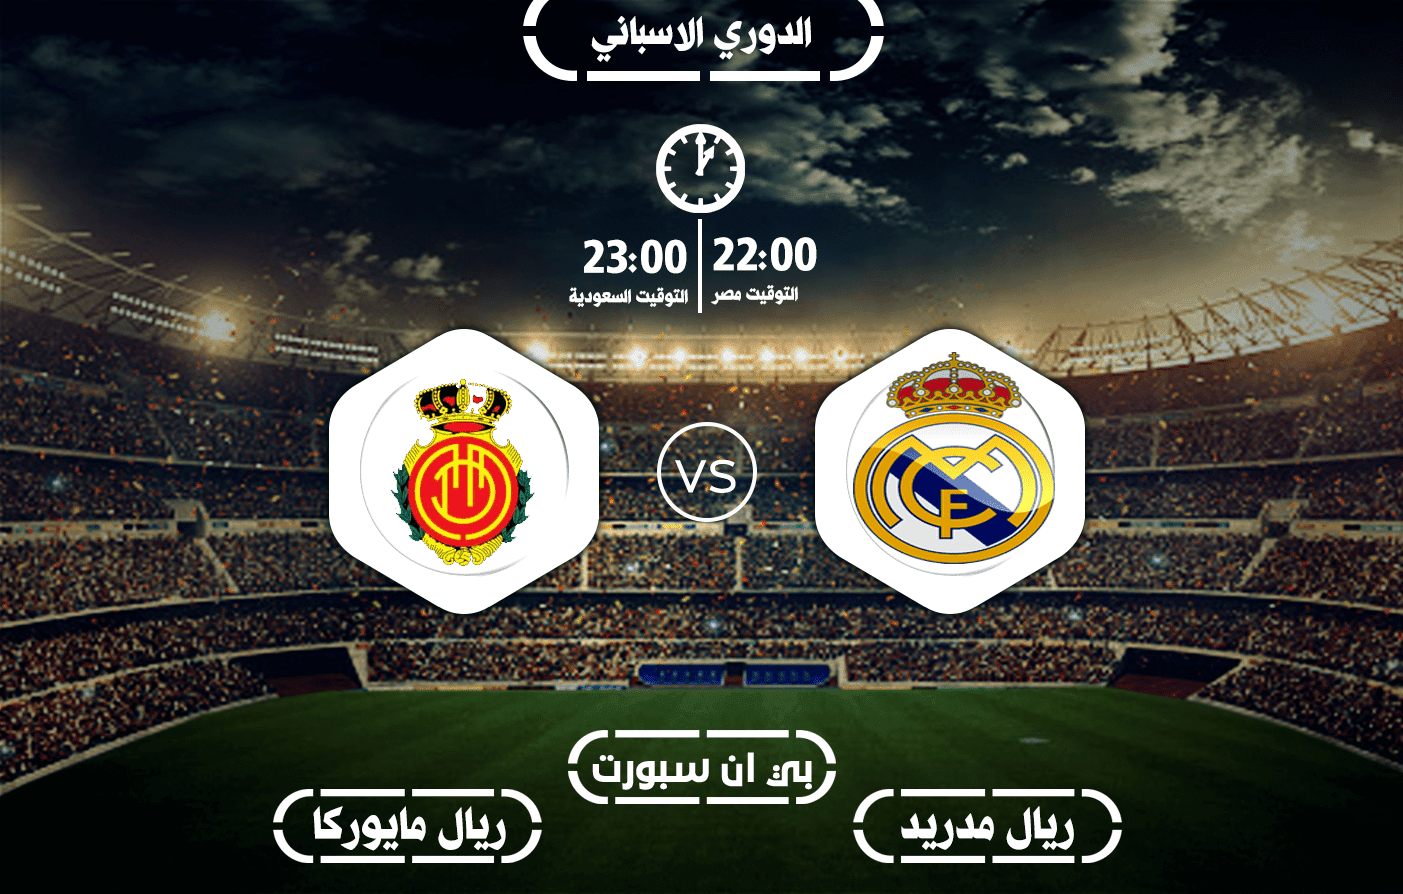 مشاهدة مباراة ريال مدريد وريال مايوركا بث مباشر 24-6-2020